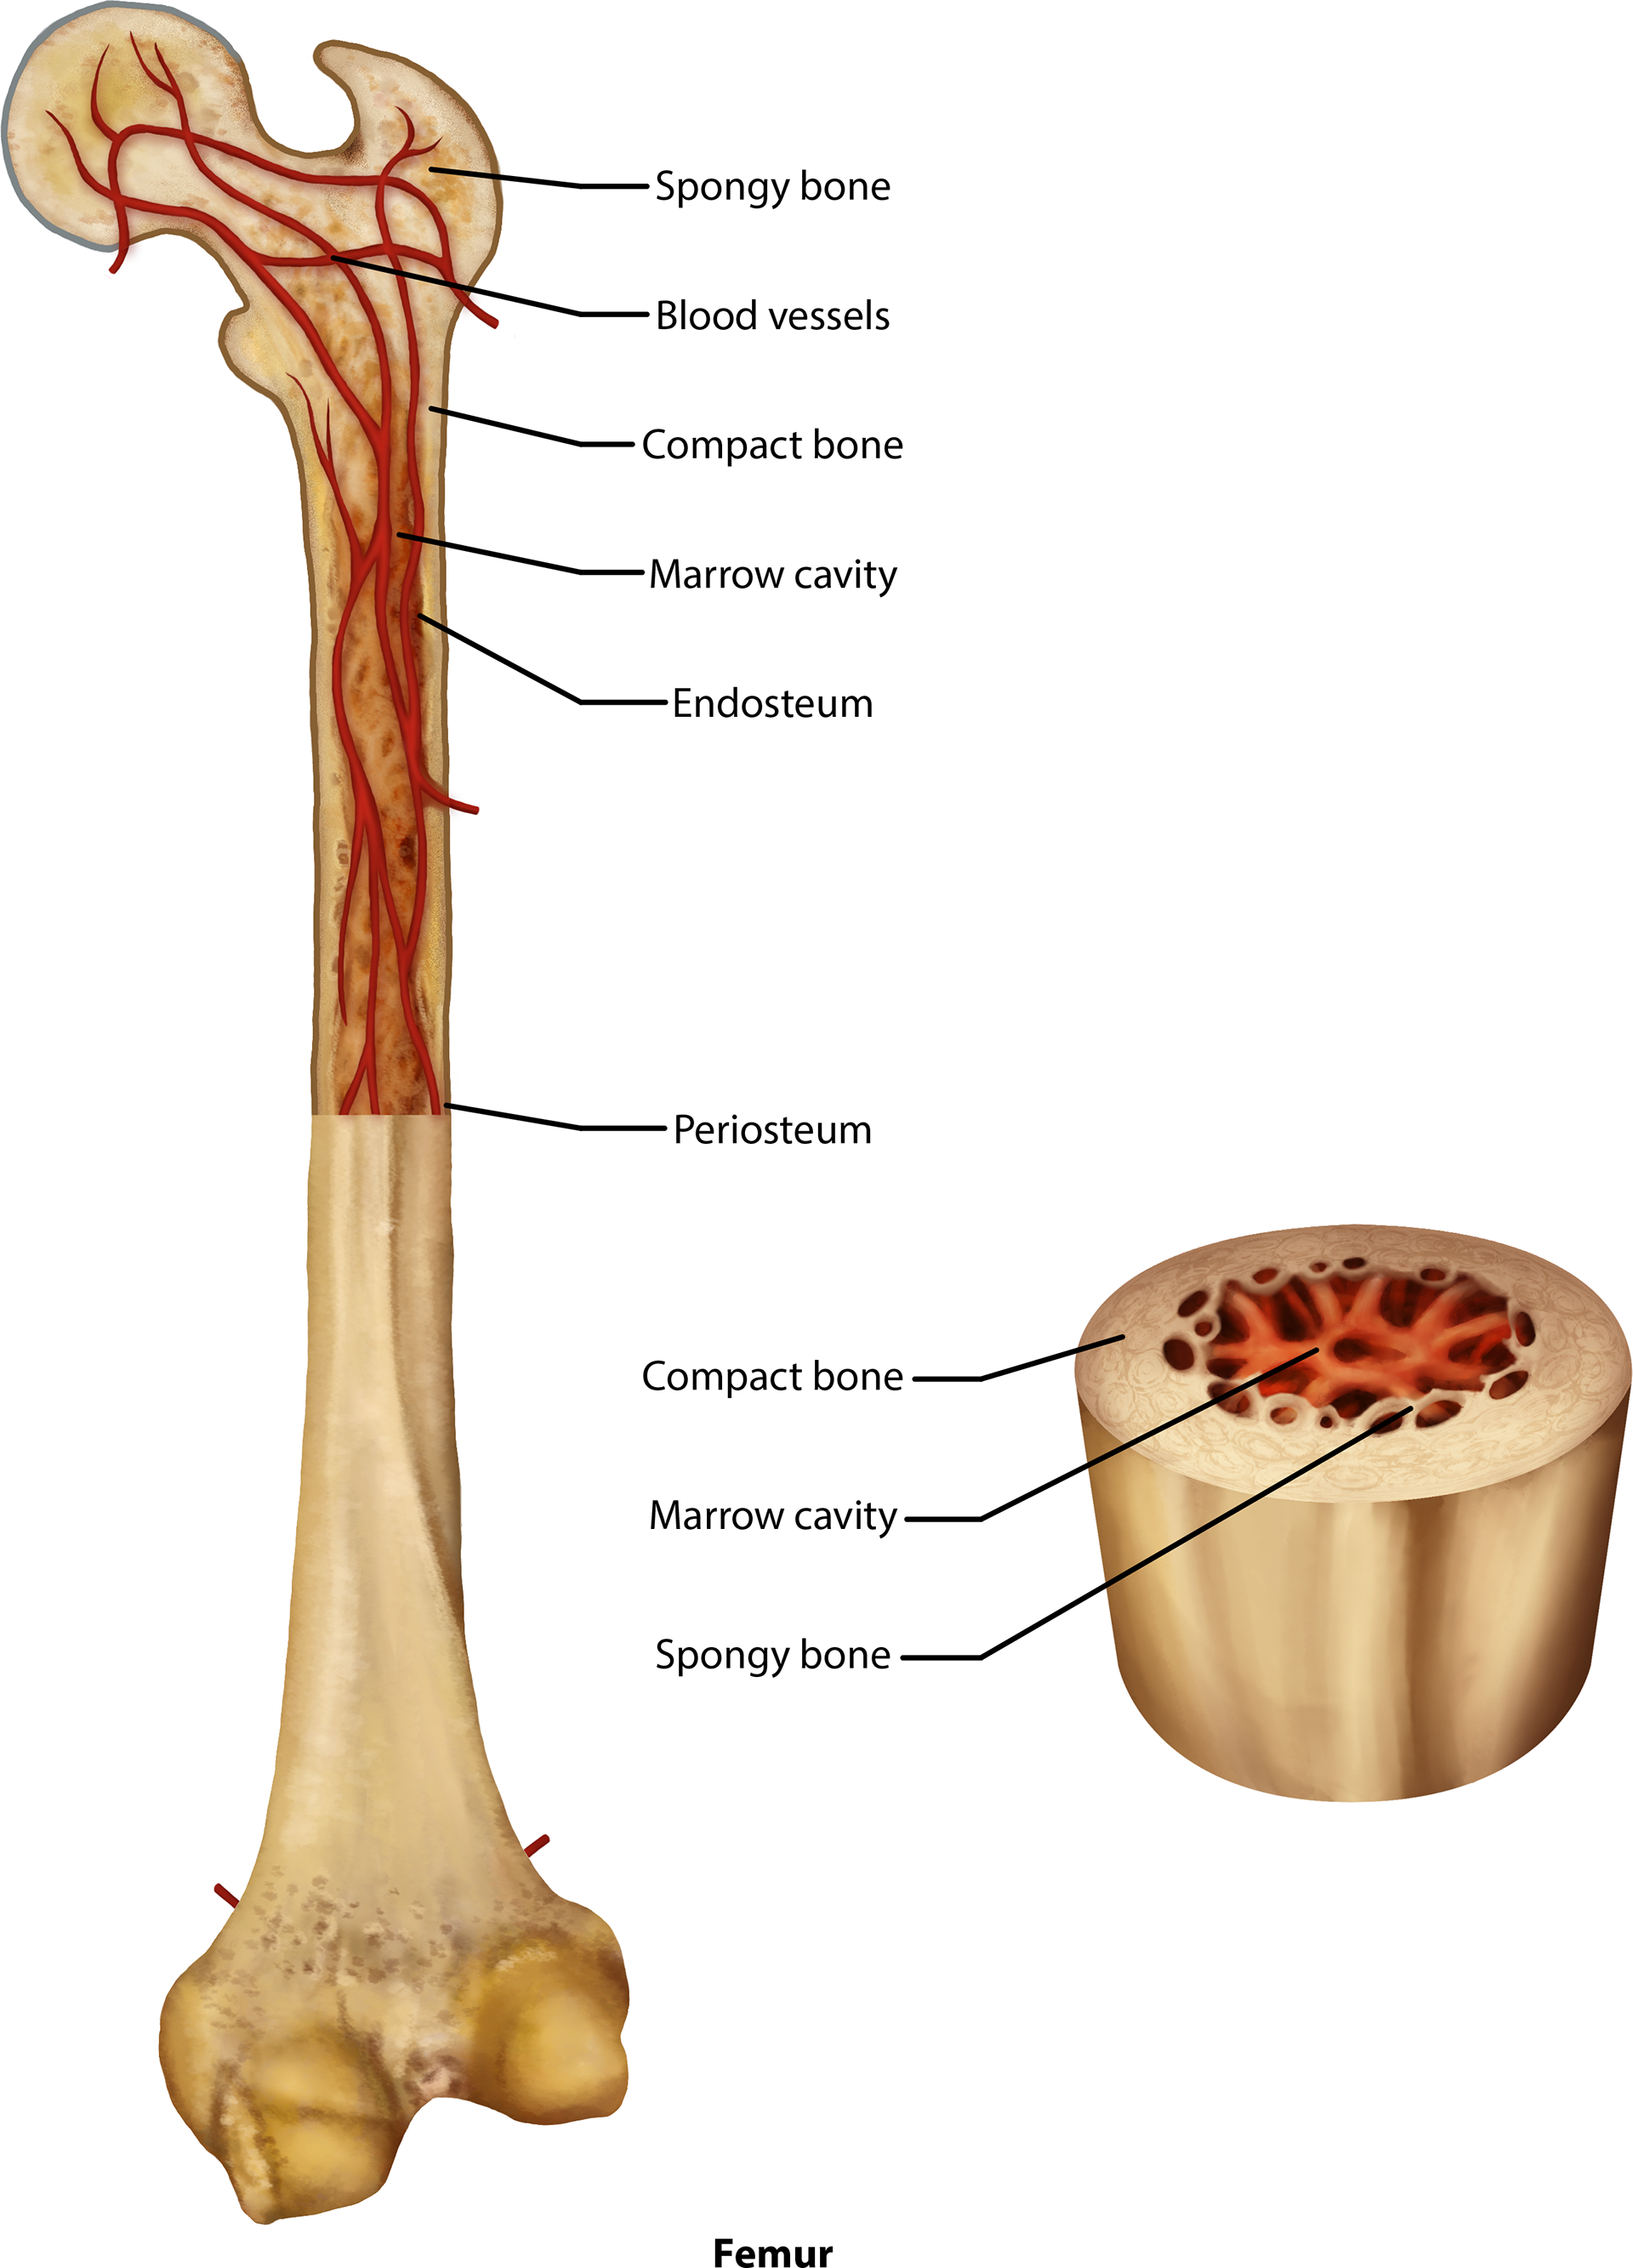 Brittany Clark - Bone Anatomy